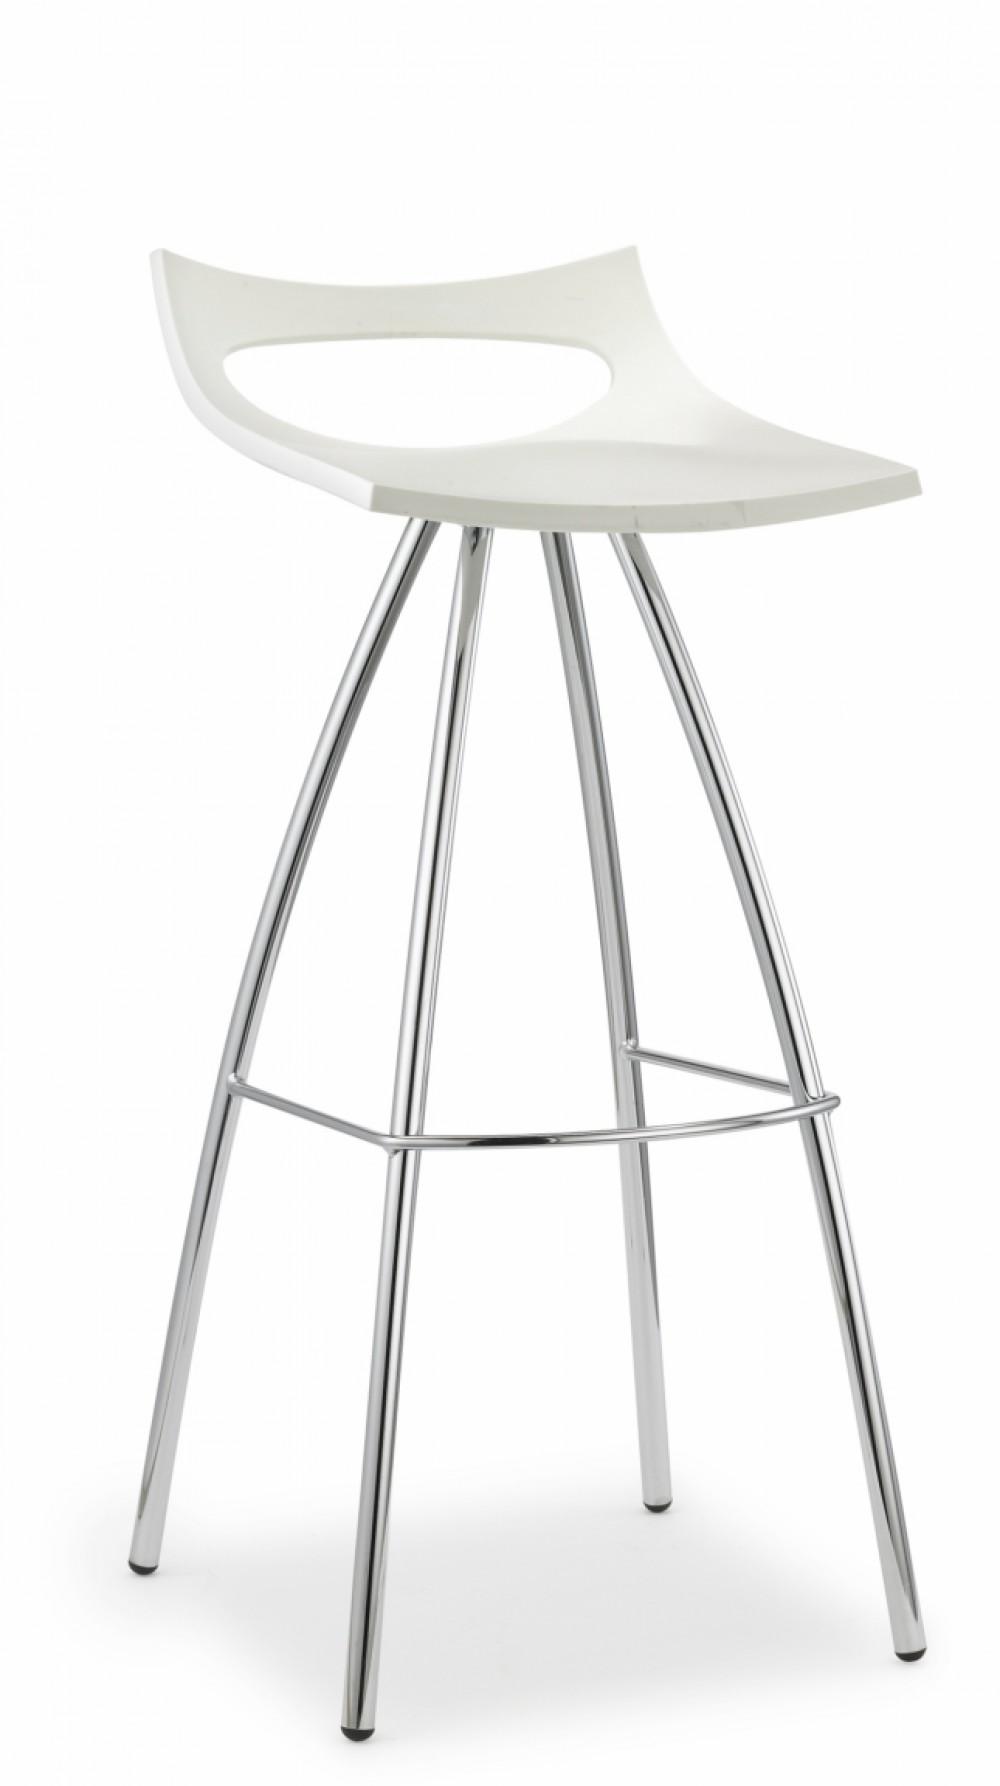 Barhocker Modern barstuhl weiß barhocker modern sitzhöhe 65 cm